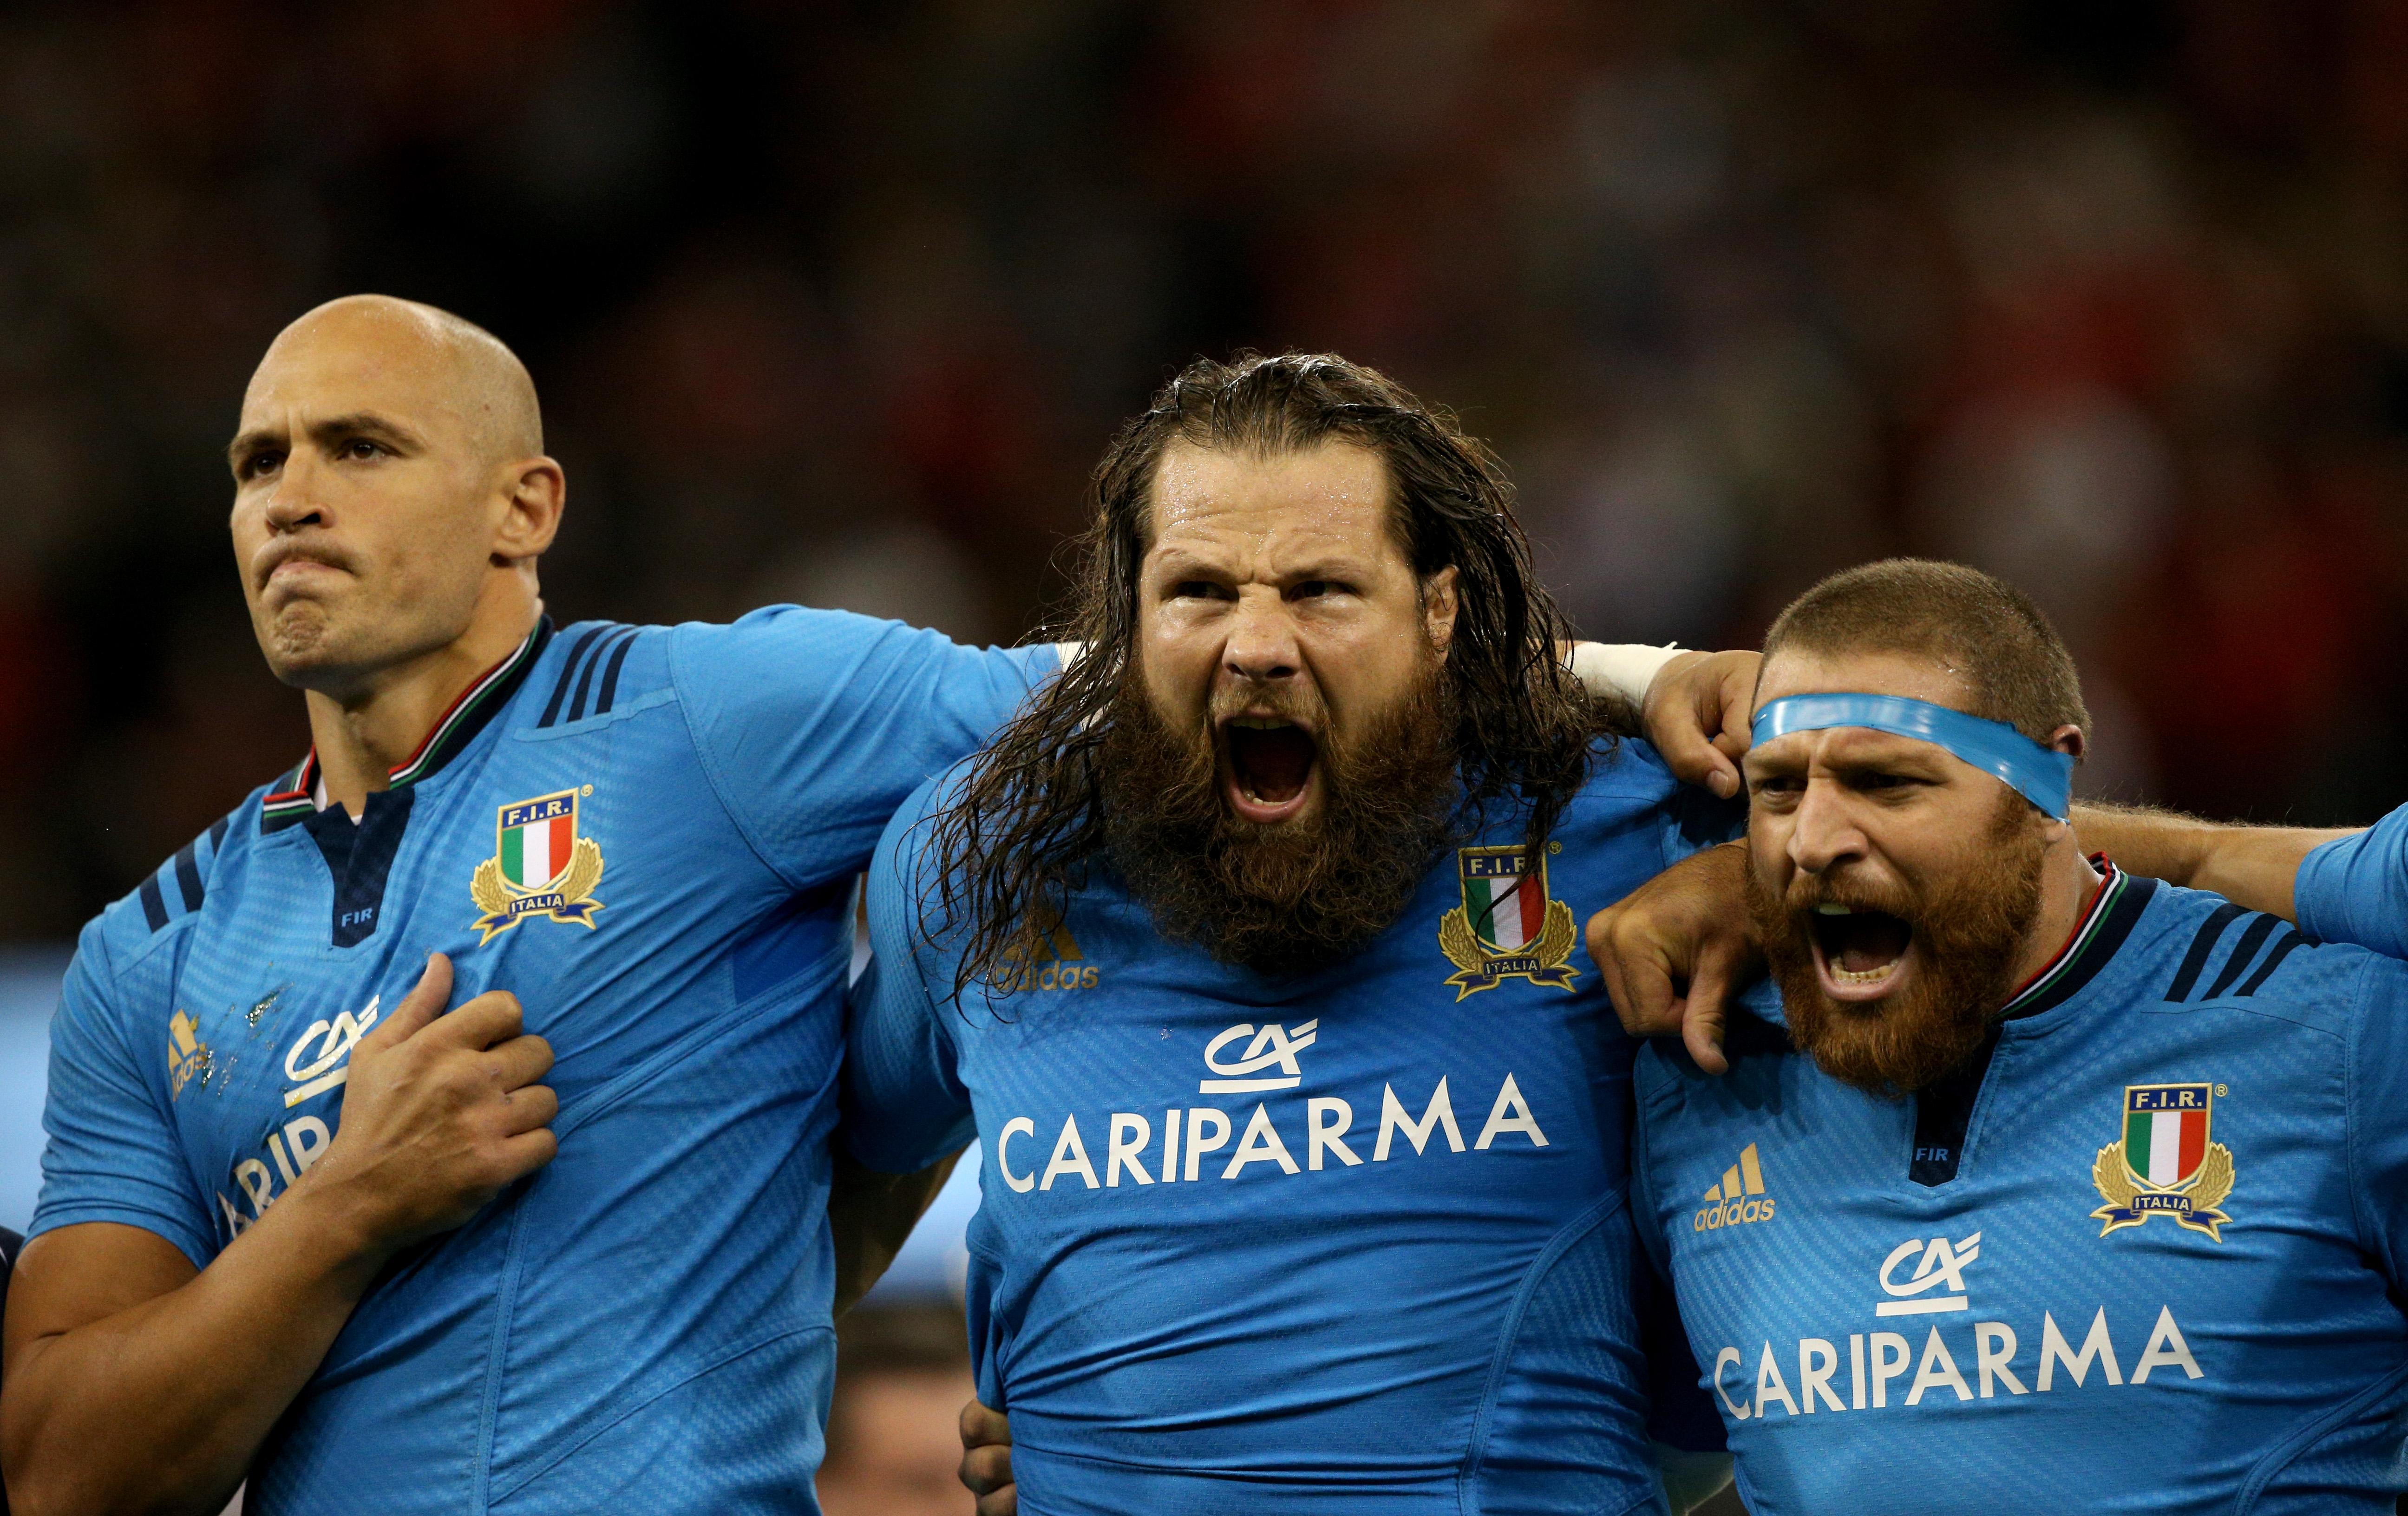 Ibrahimovic Swedish Anthem Italians Screaming Anthem Rugby World Cup